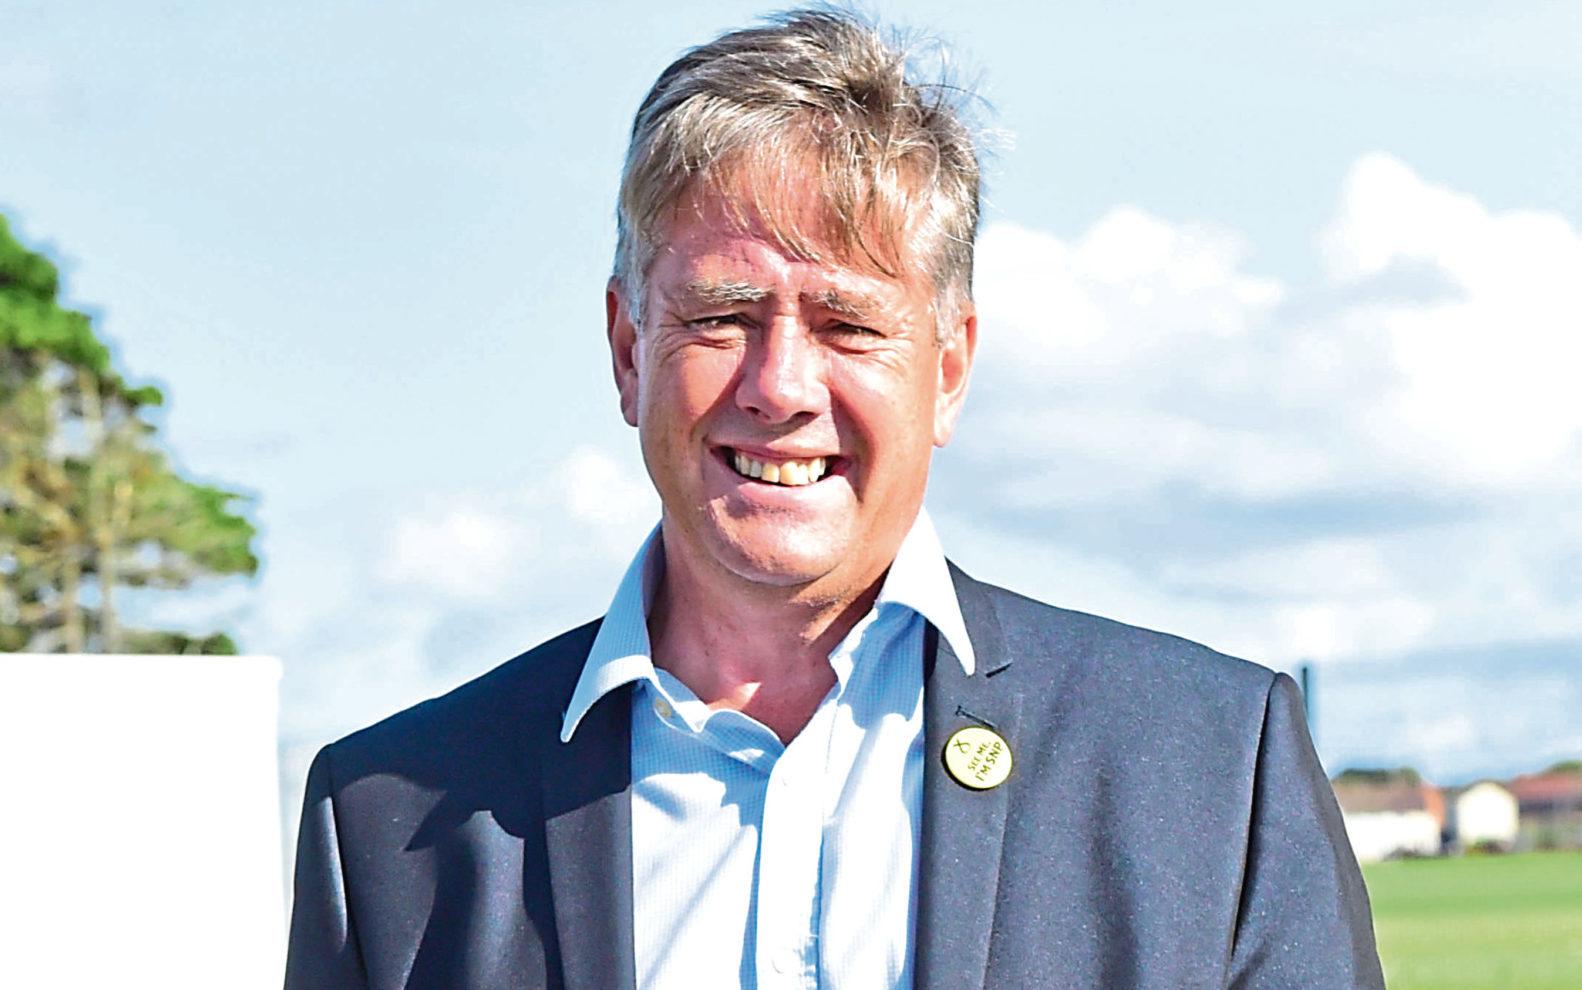 Keith Brown, depute leader of the SNP (Paul Chappells)